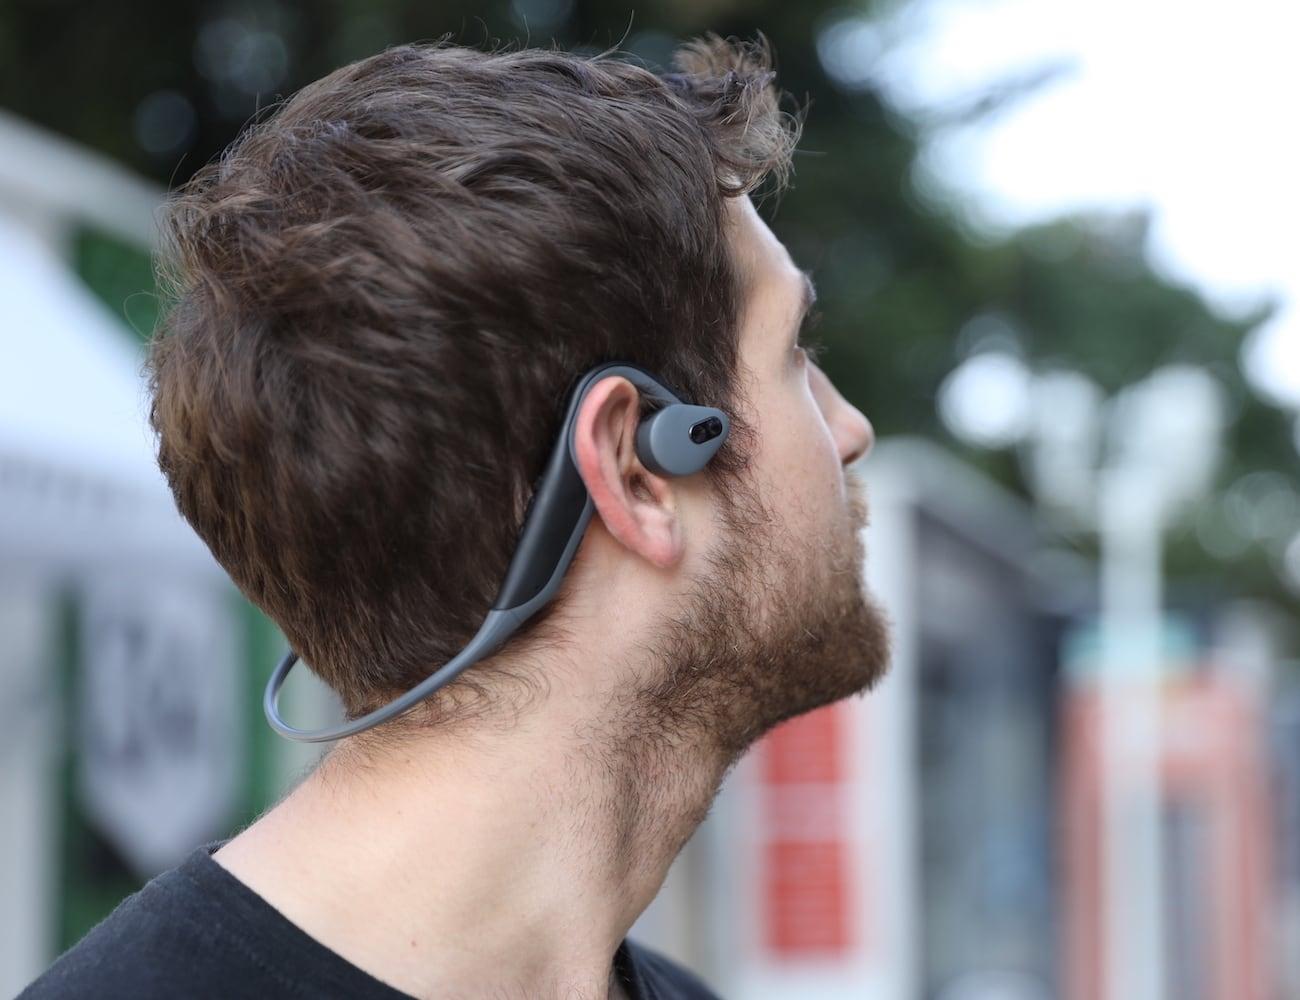 BoneTalker Adder Bone Conduction Bluetooth Headphones keep your ears open